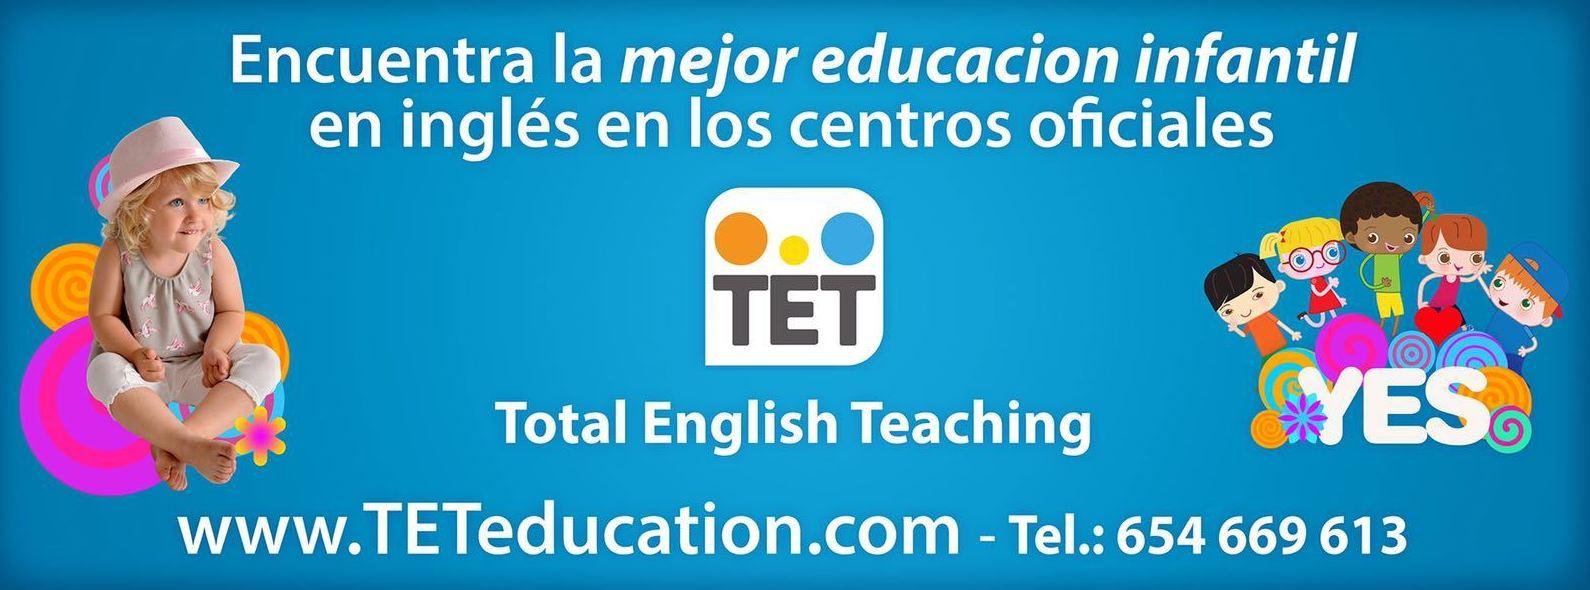 TET Guardería bilingüe Osobuco